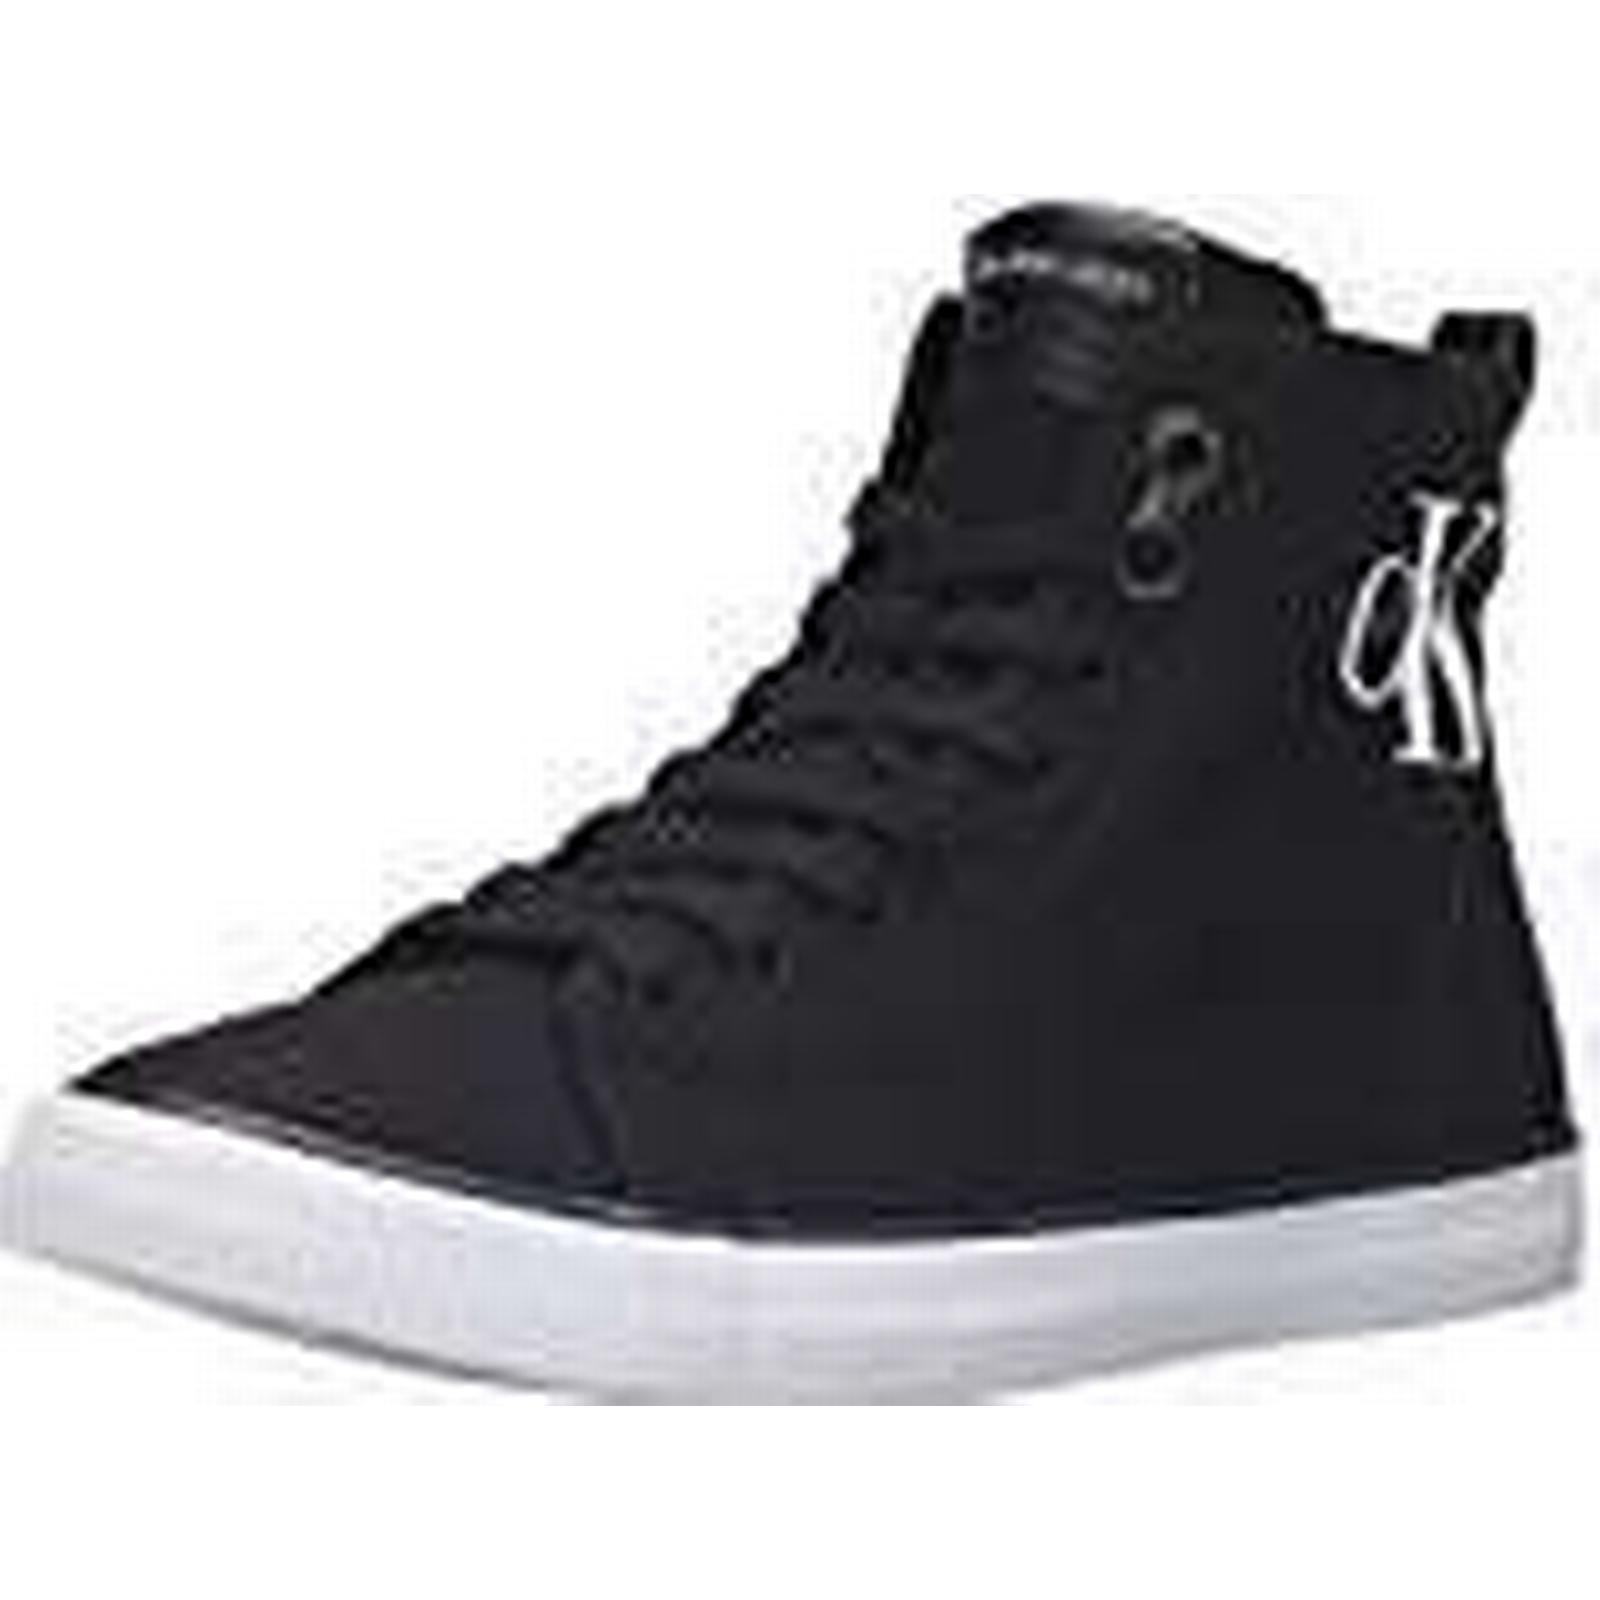 Calvin Klein Arthur (Black), Canvas, Men's Sneakers, Black (Black), Arthur 9 UK (44 EU) 20f9de